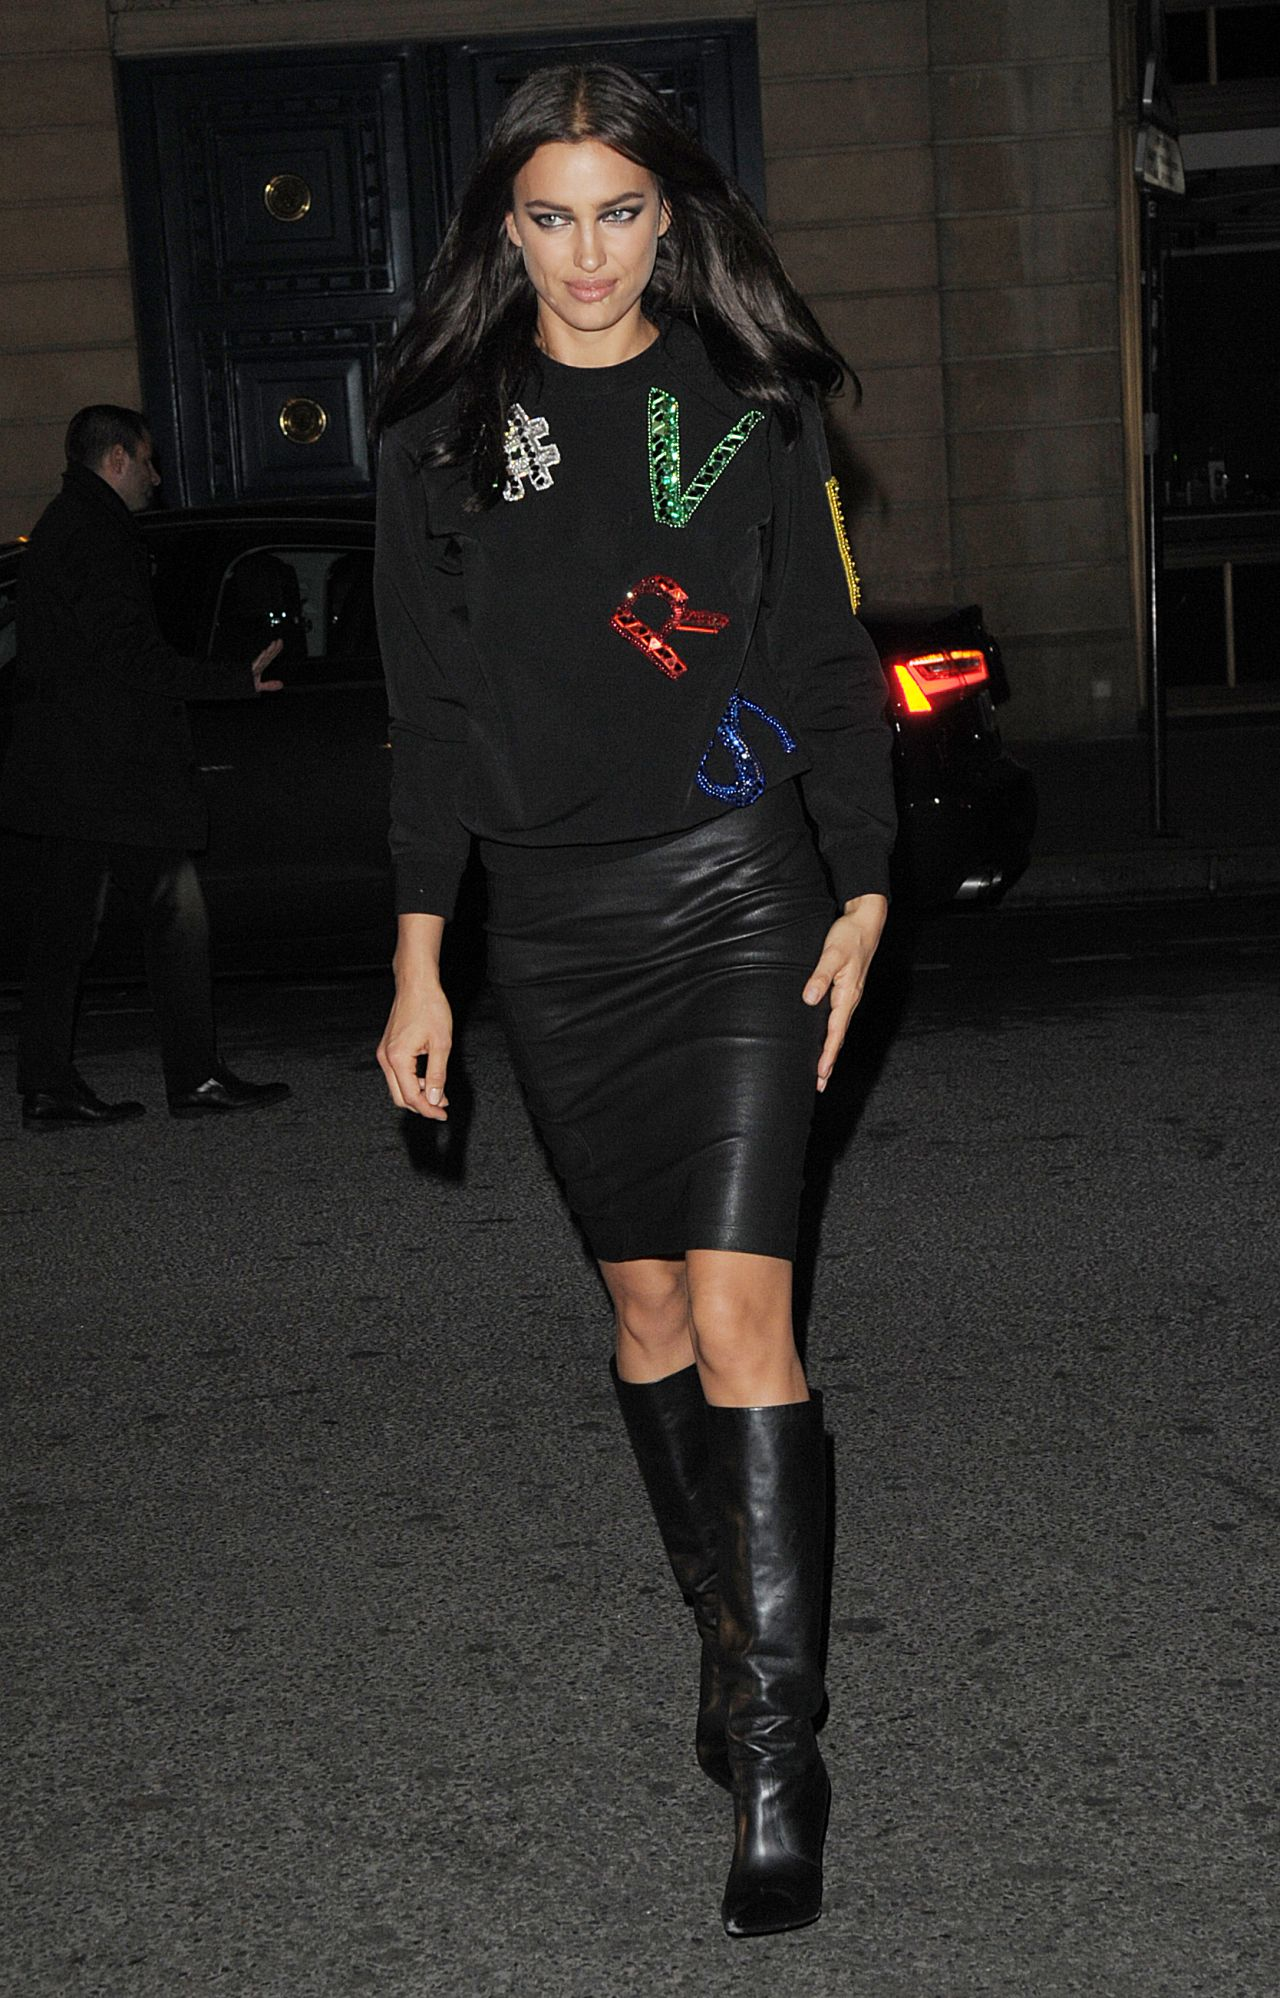 Irina Shayk Paris Fashion Week In Paris 01 24 2016